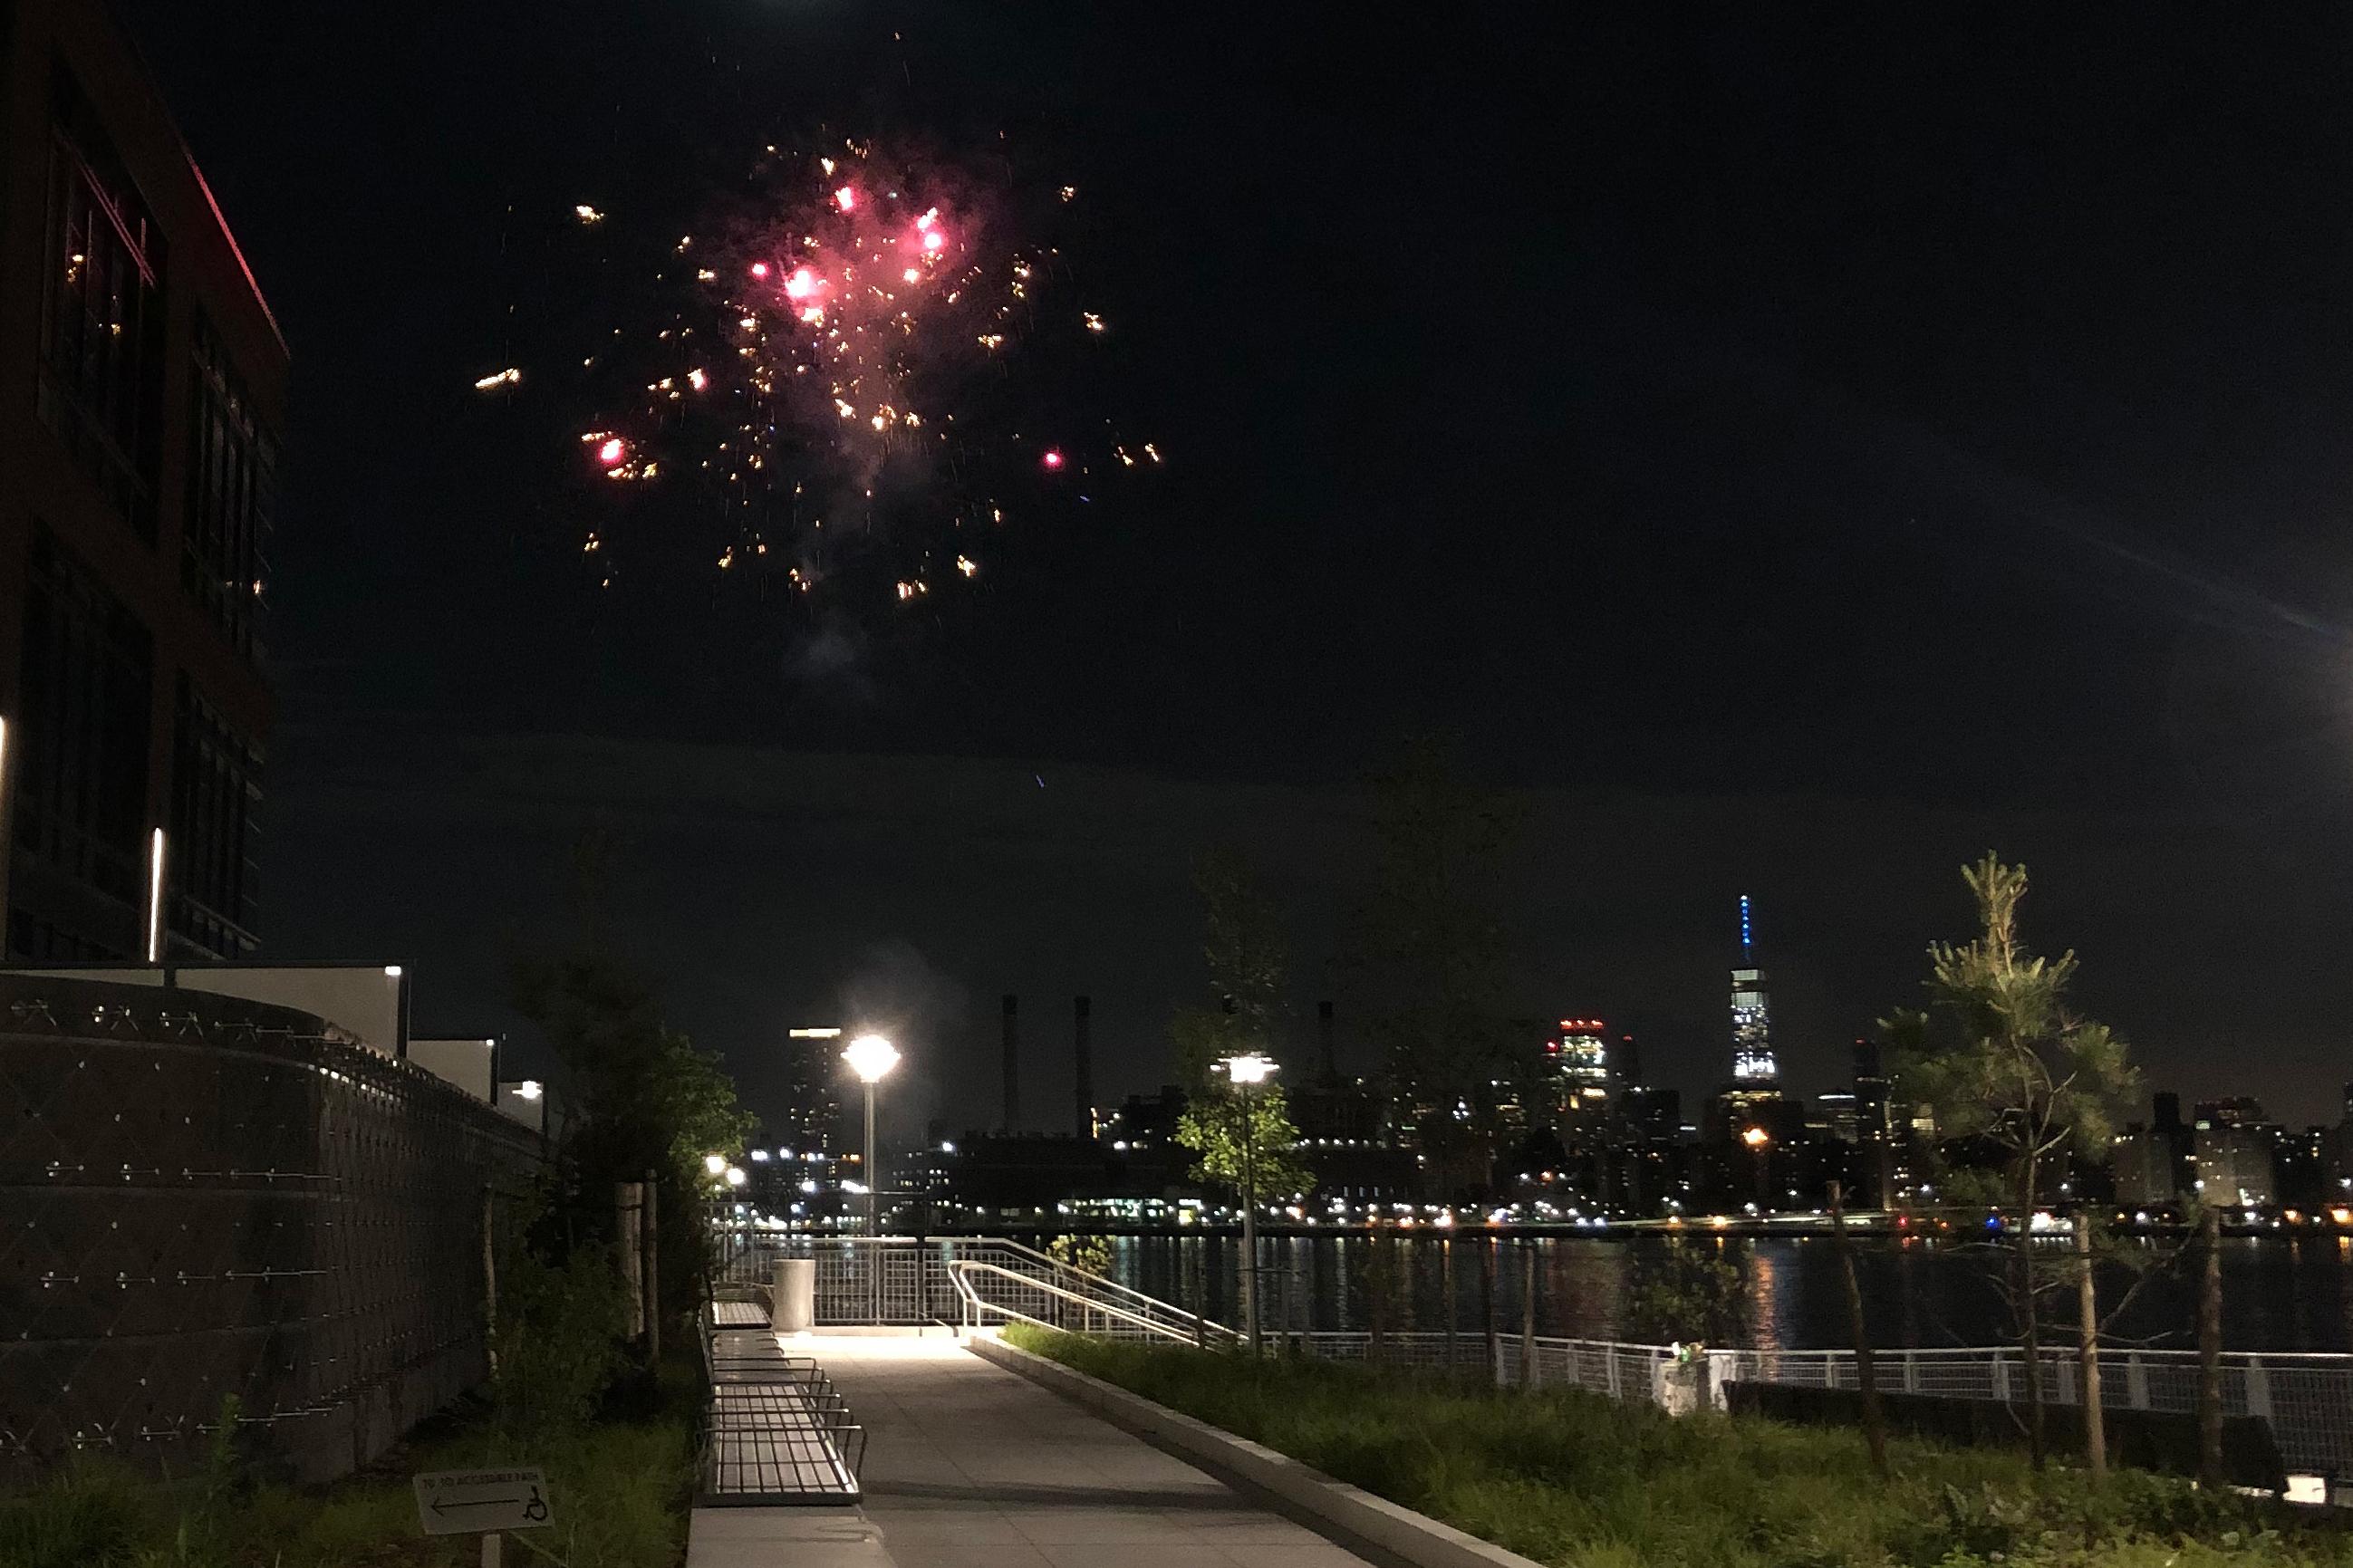 Fireworks in Greenpoint, Brooklyn, June 30, 2020.